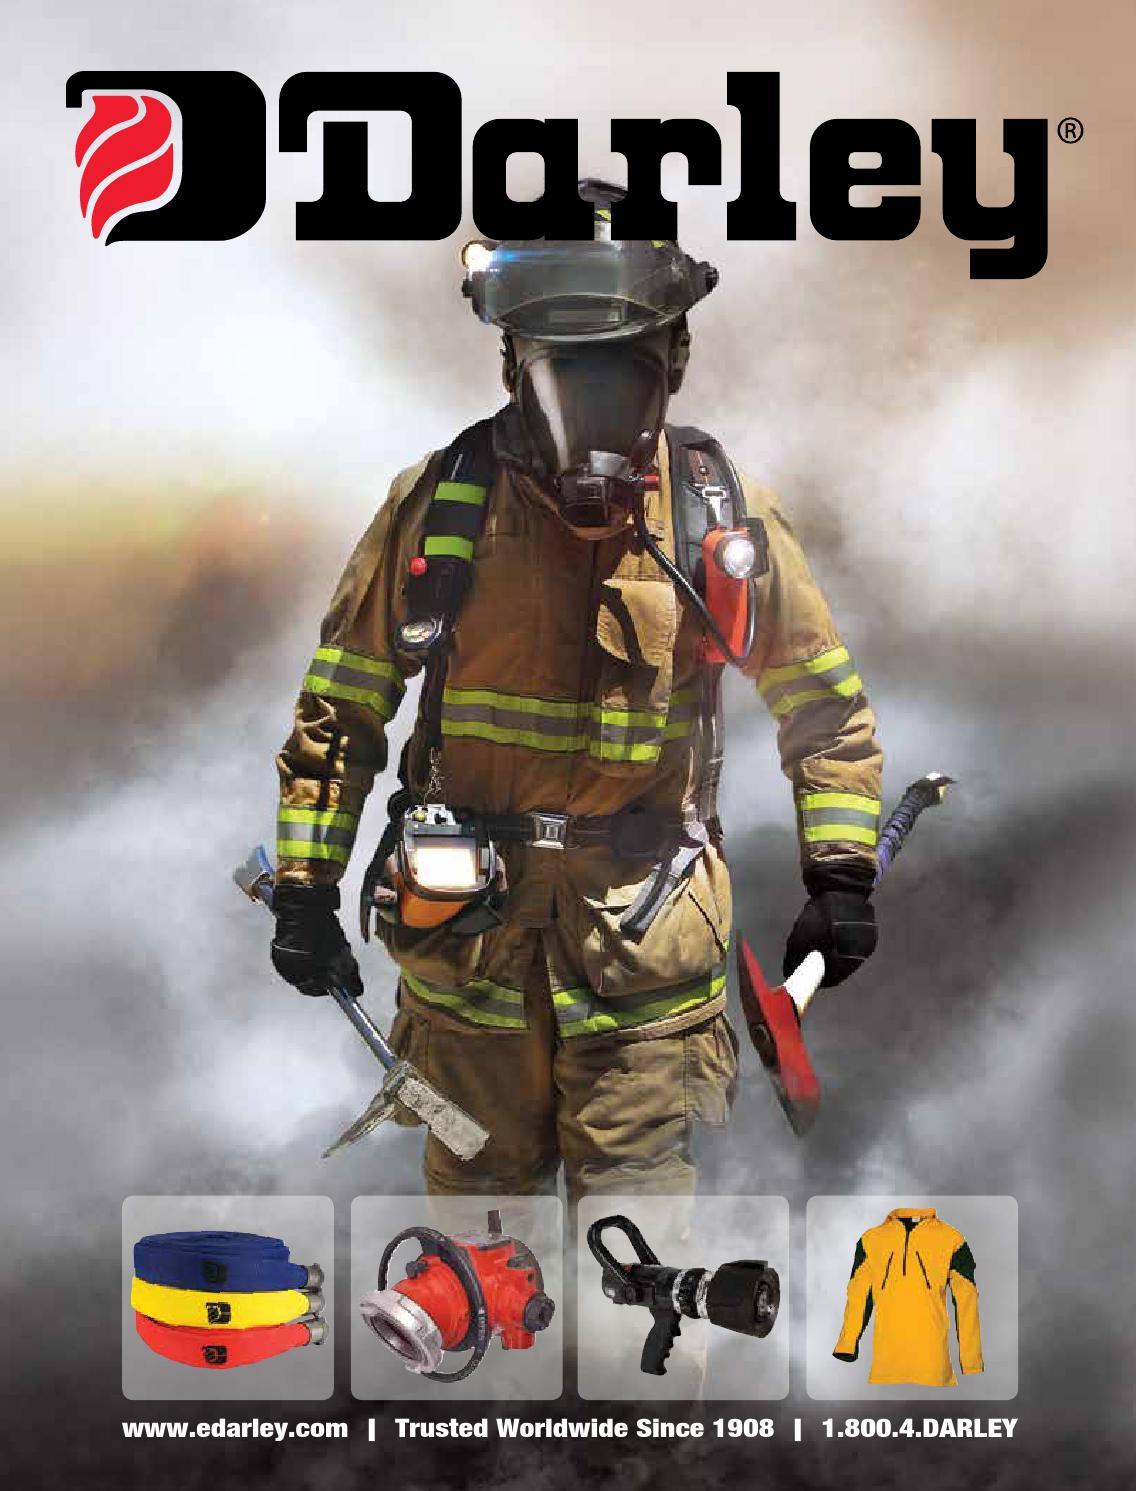 1//6 Scale toy America/'s Finest Urban Firefighter Fireman Oxygen Tank /& Mask Set